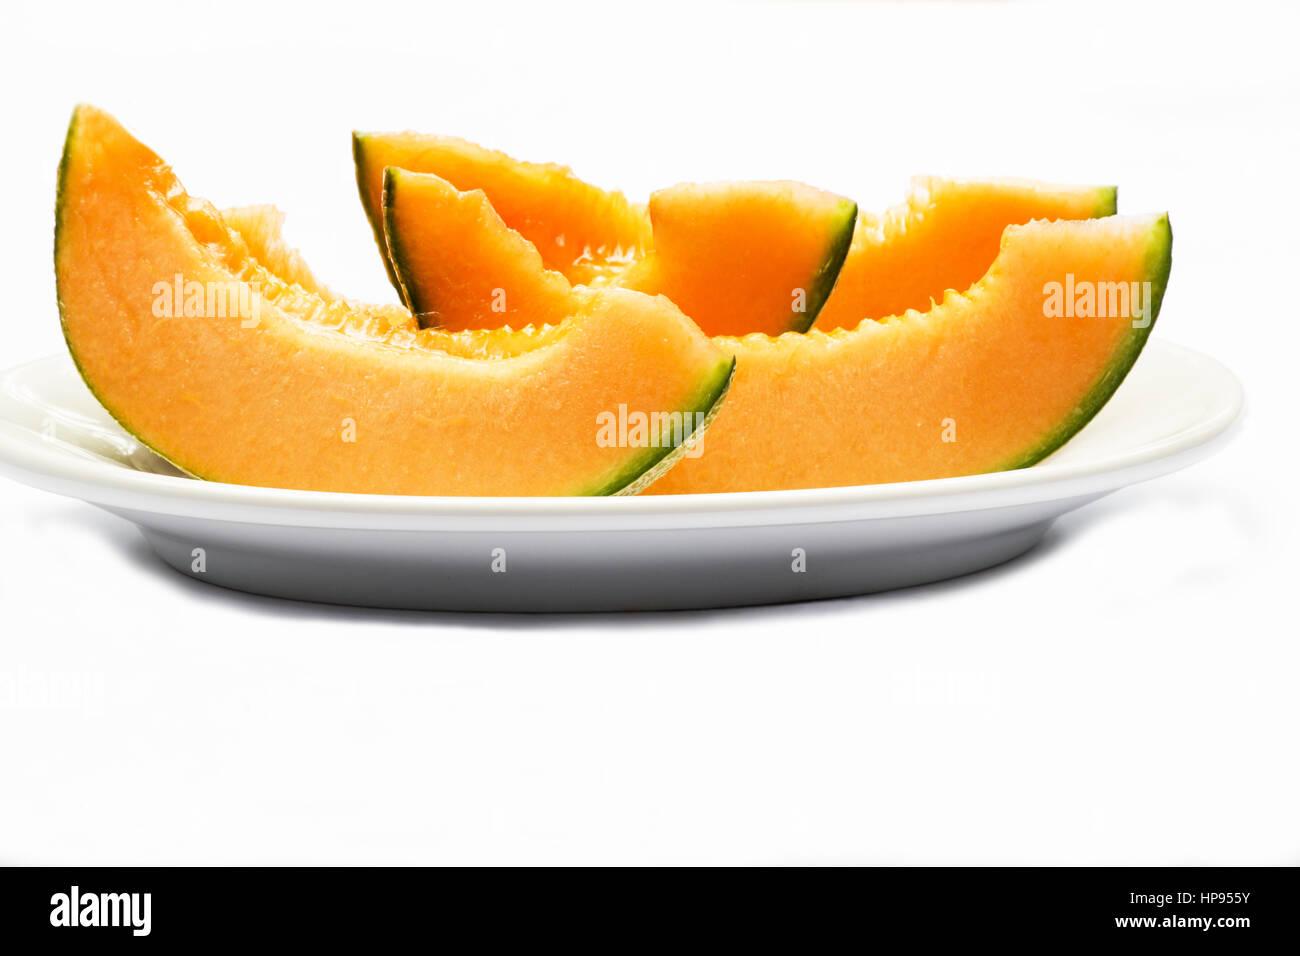 Melon slices on white background - Stock Image